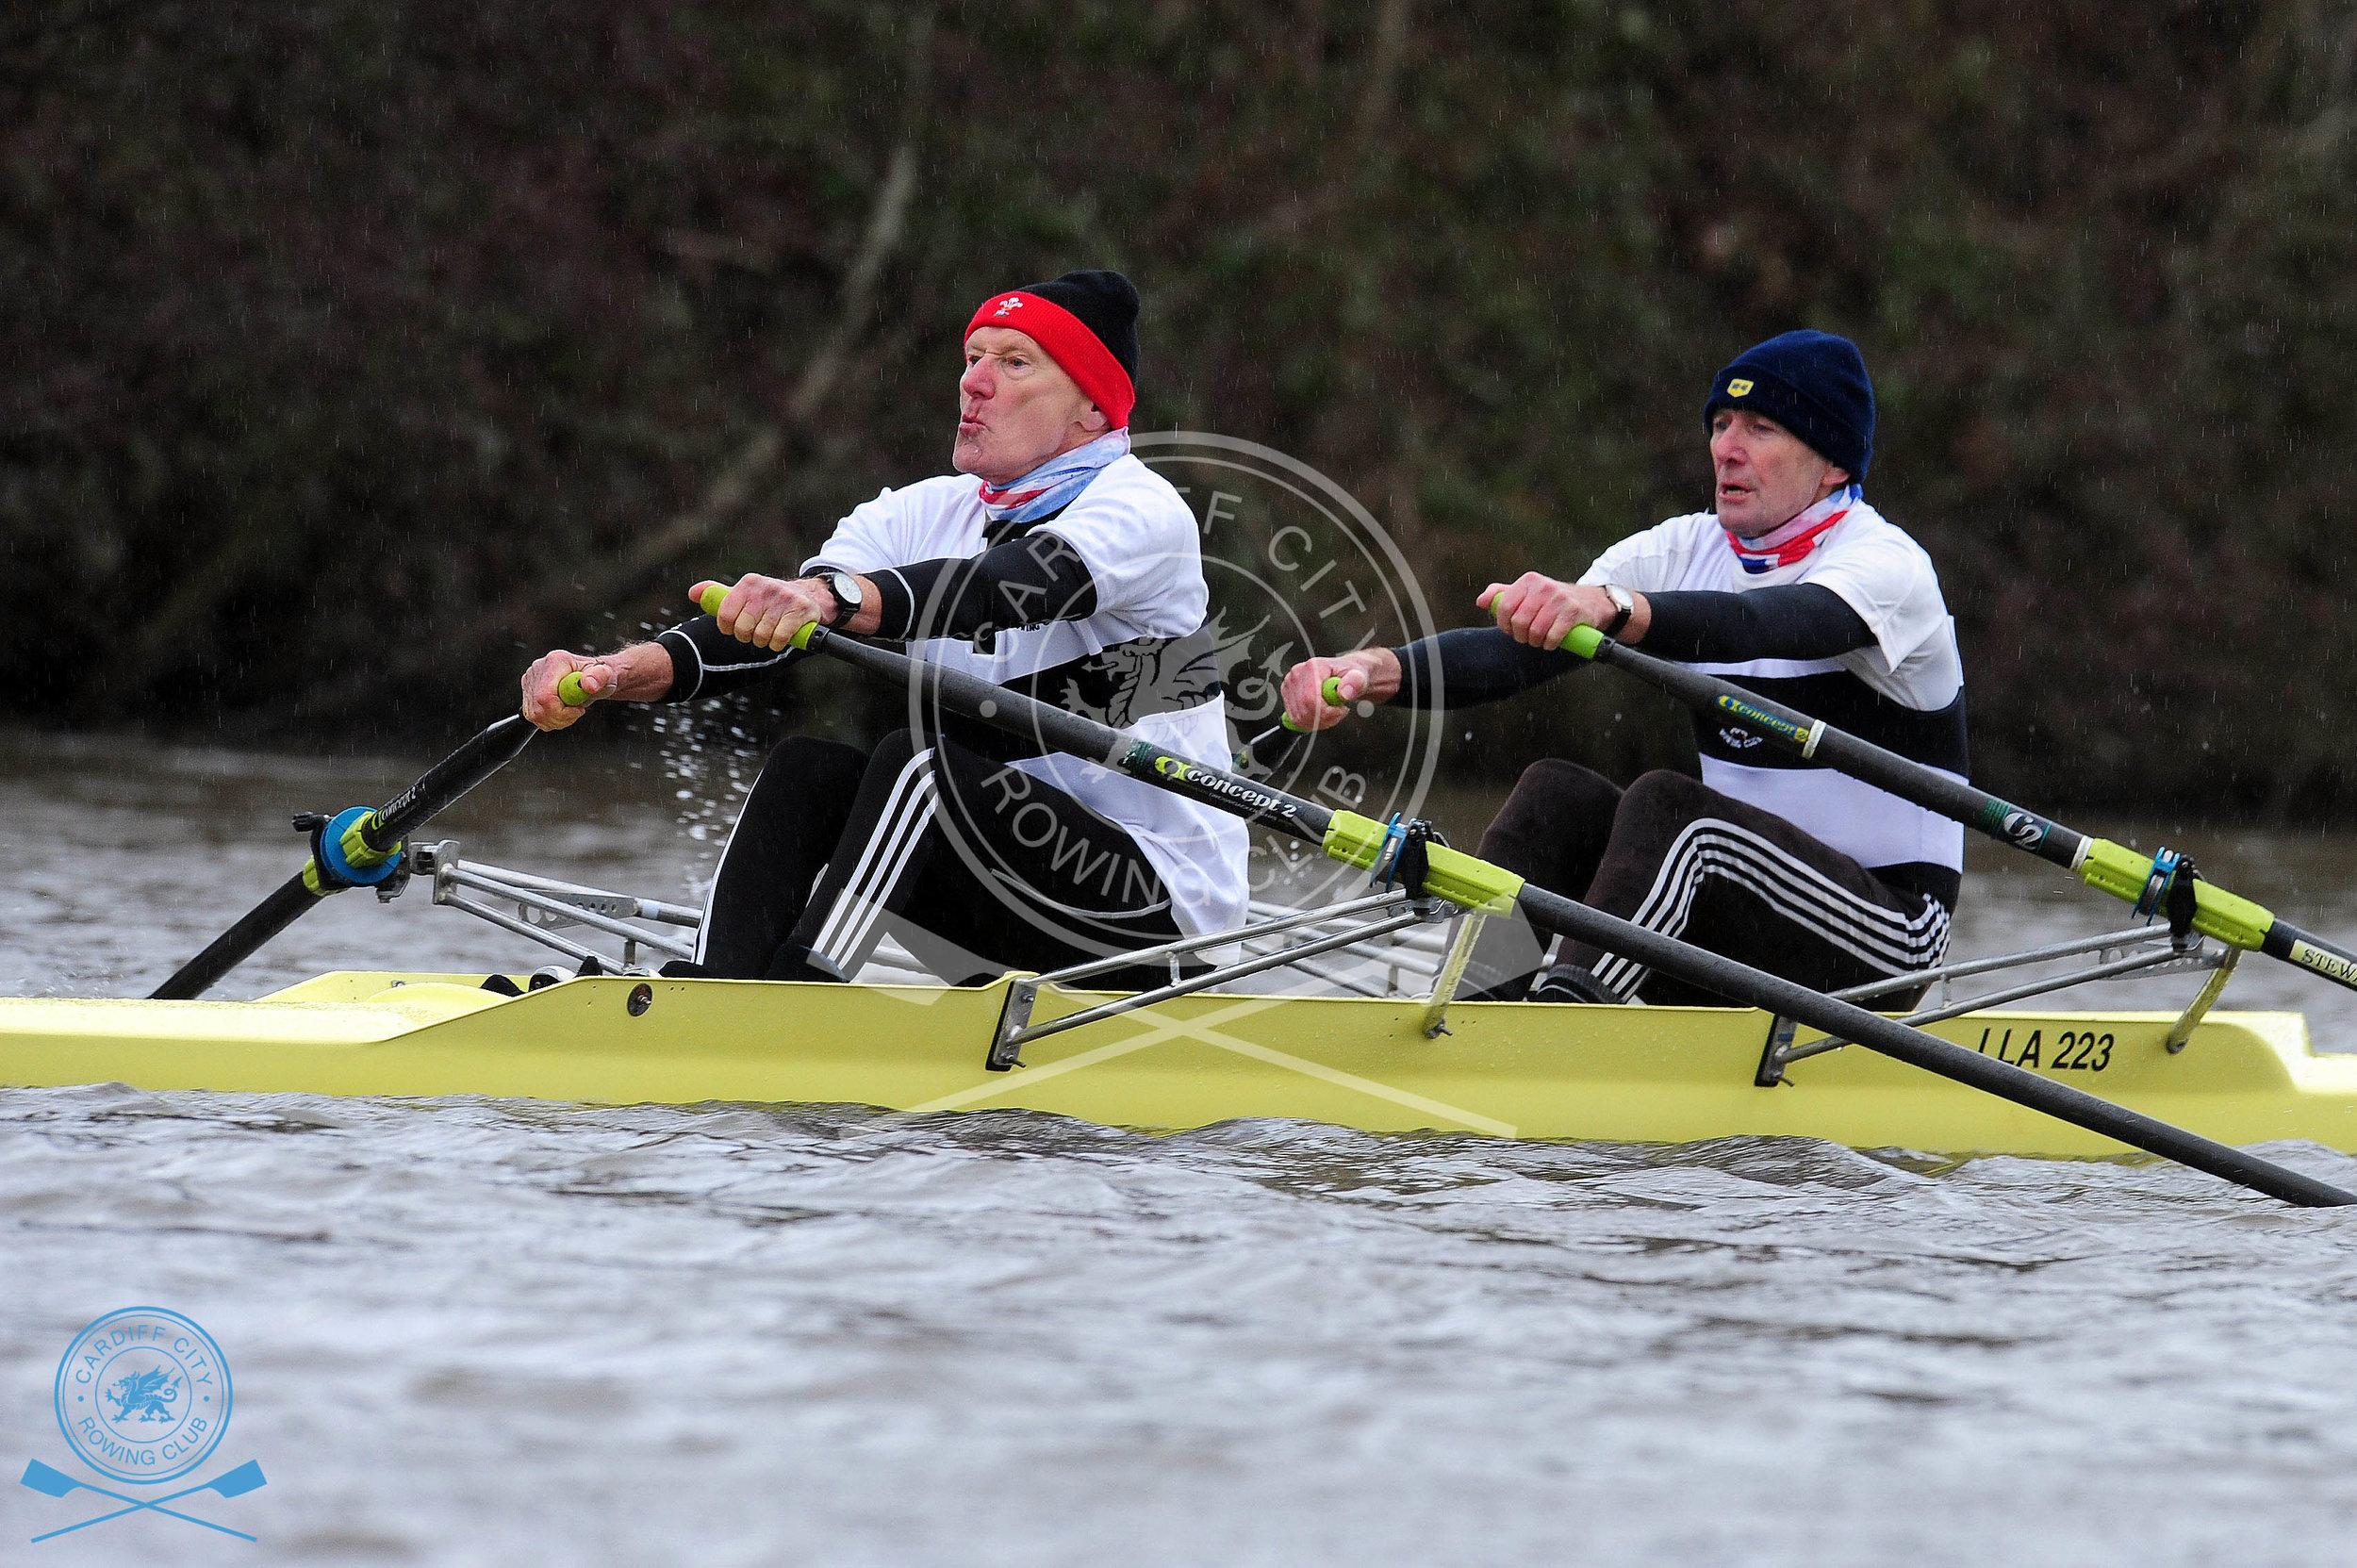 DW_280119_Cardiff_City_Rowing_285.jpg